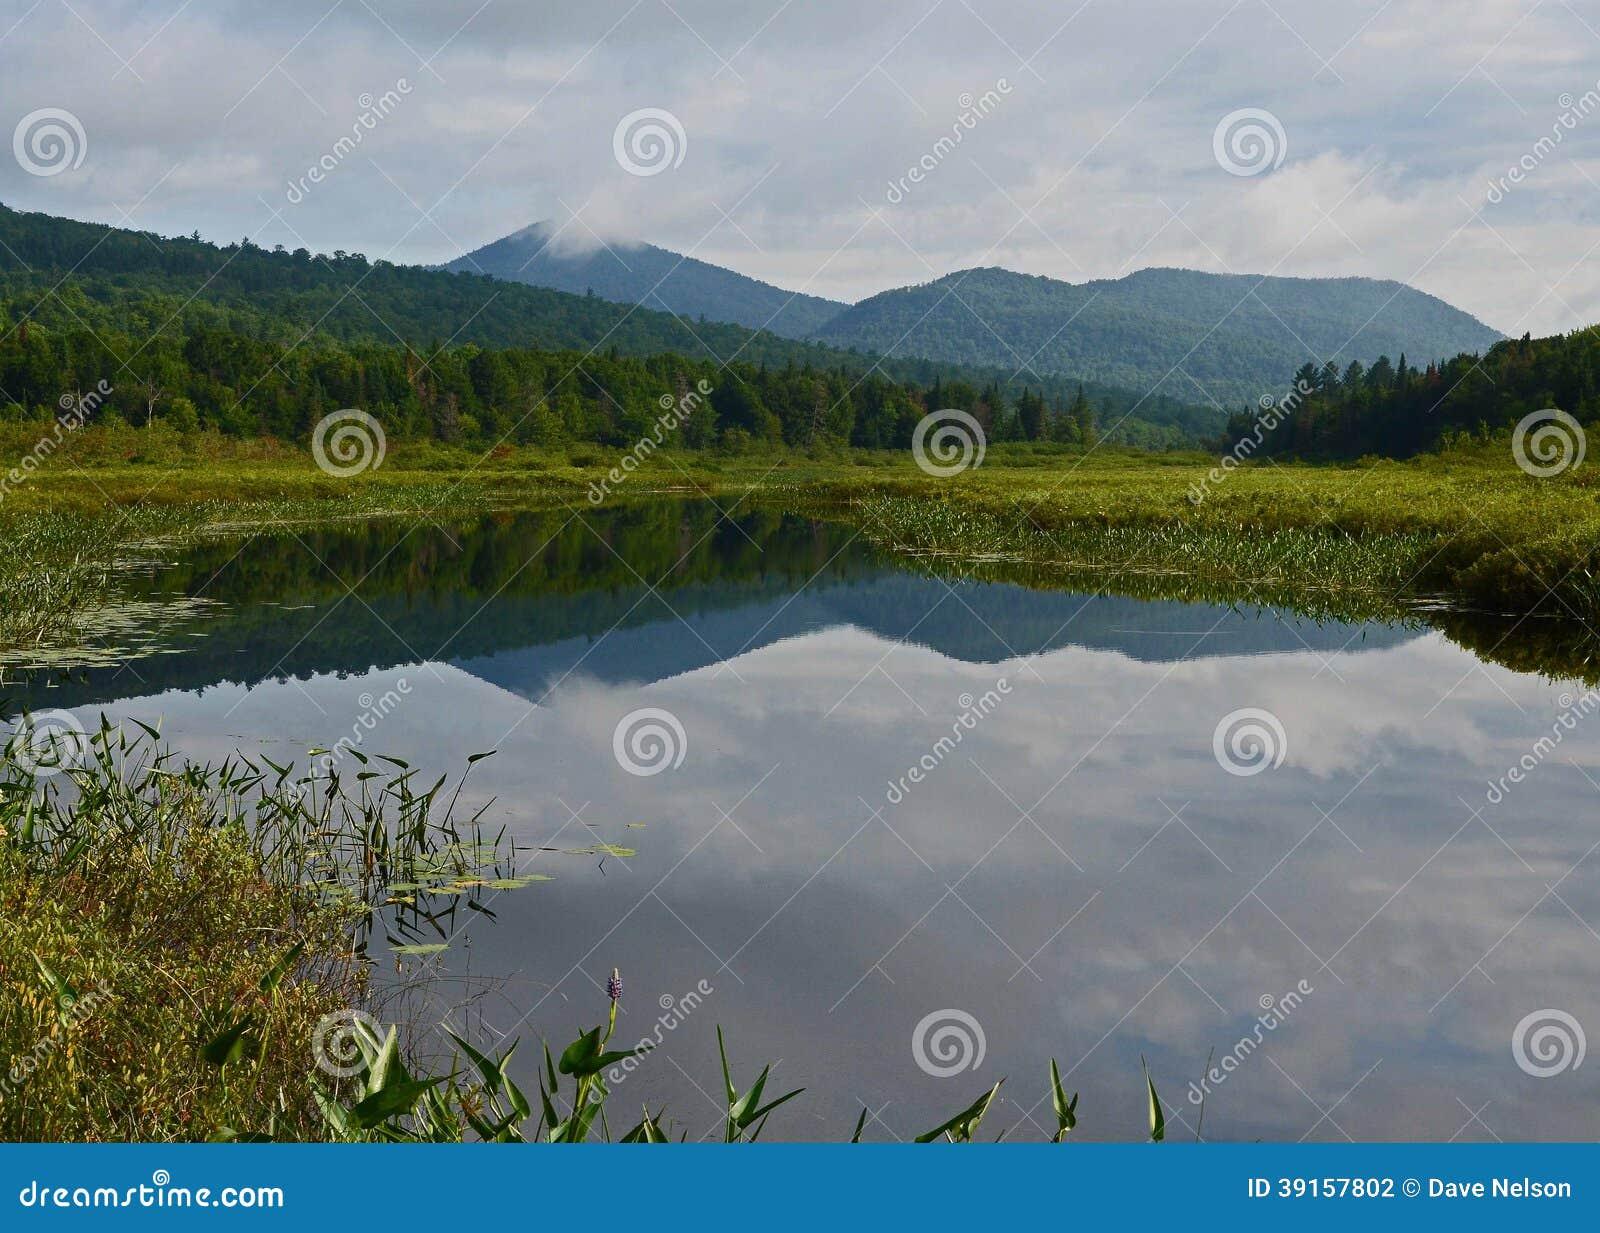 Adirondack wilderness waterway and mountains landscape